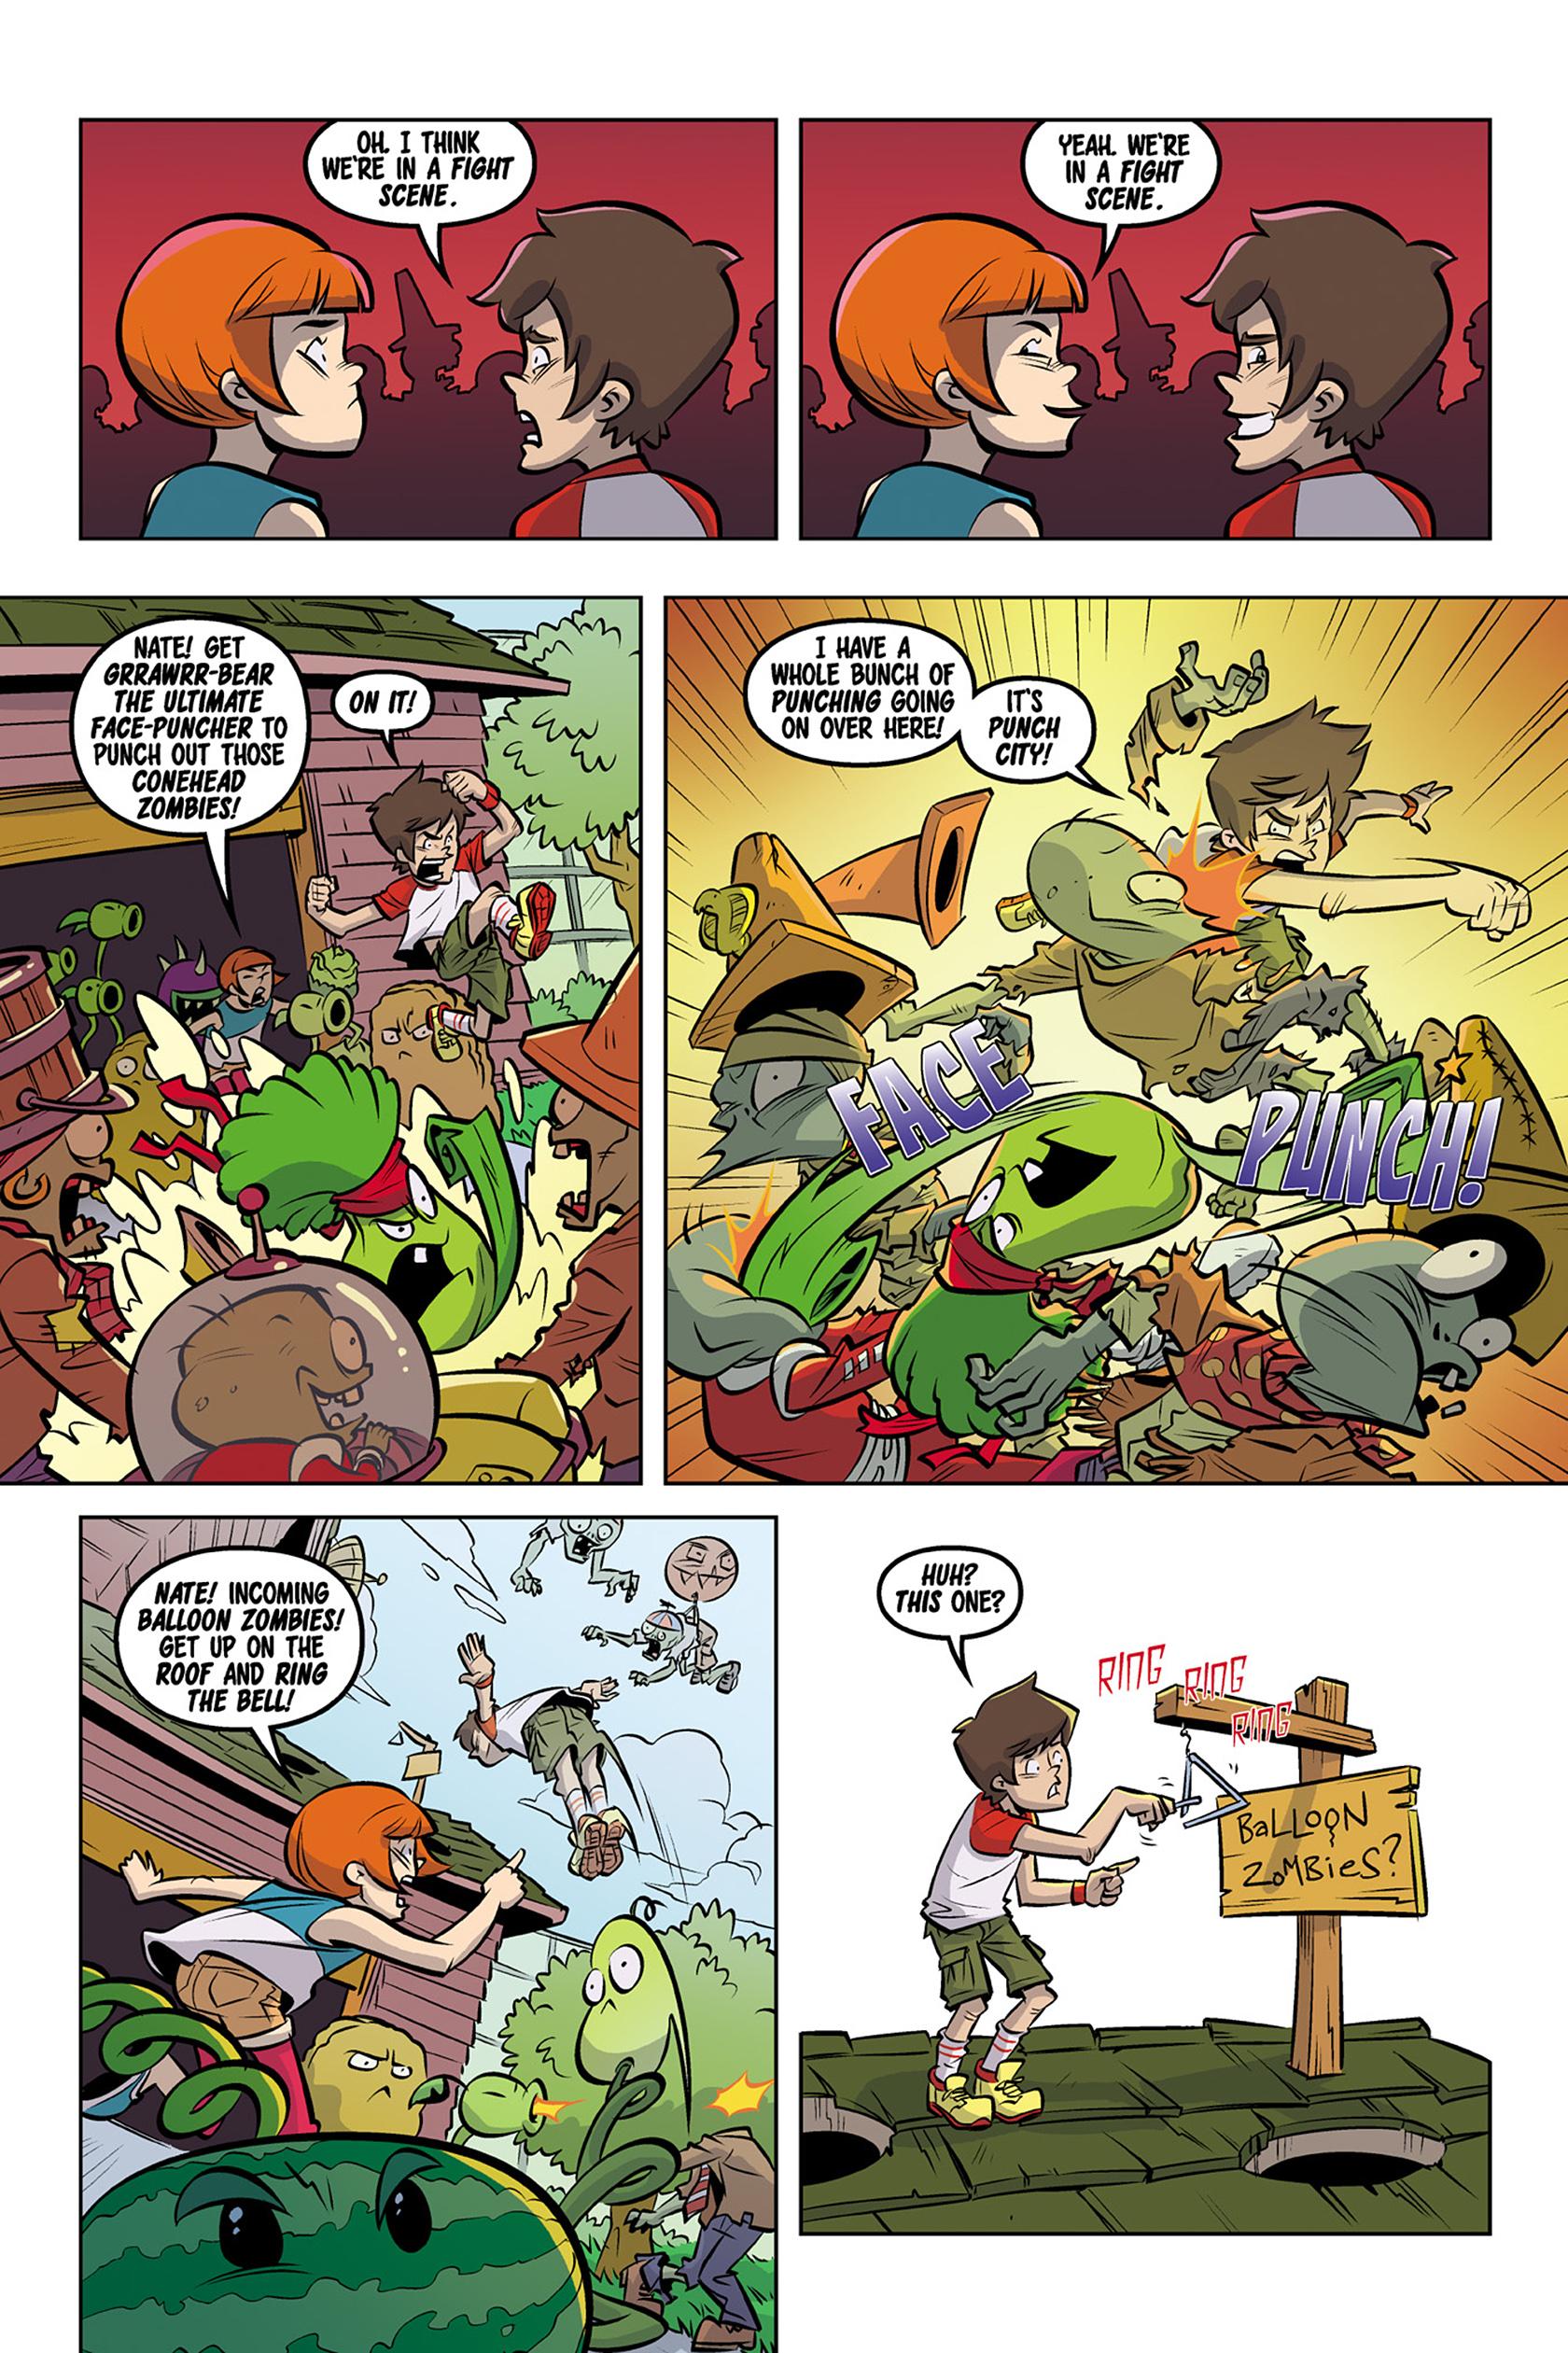 Plants Vs Zombies - Read Free Comics Online Plants Vs -3326